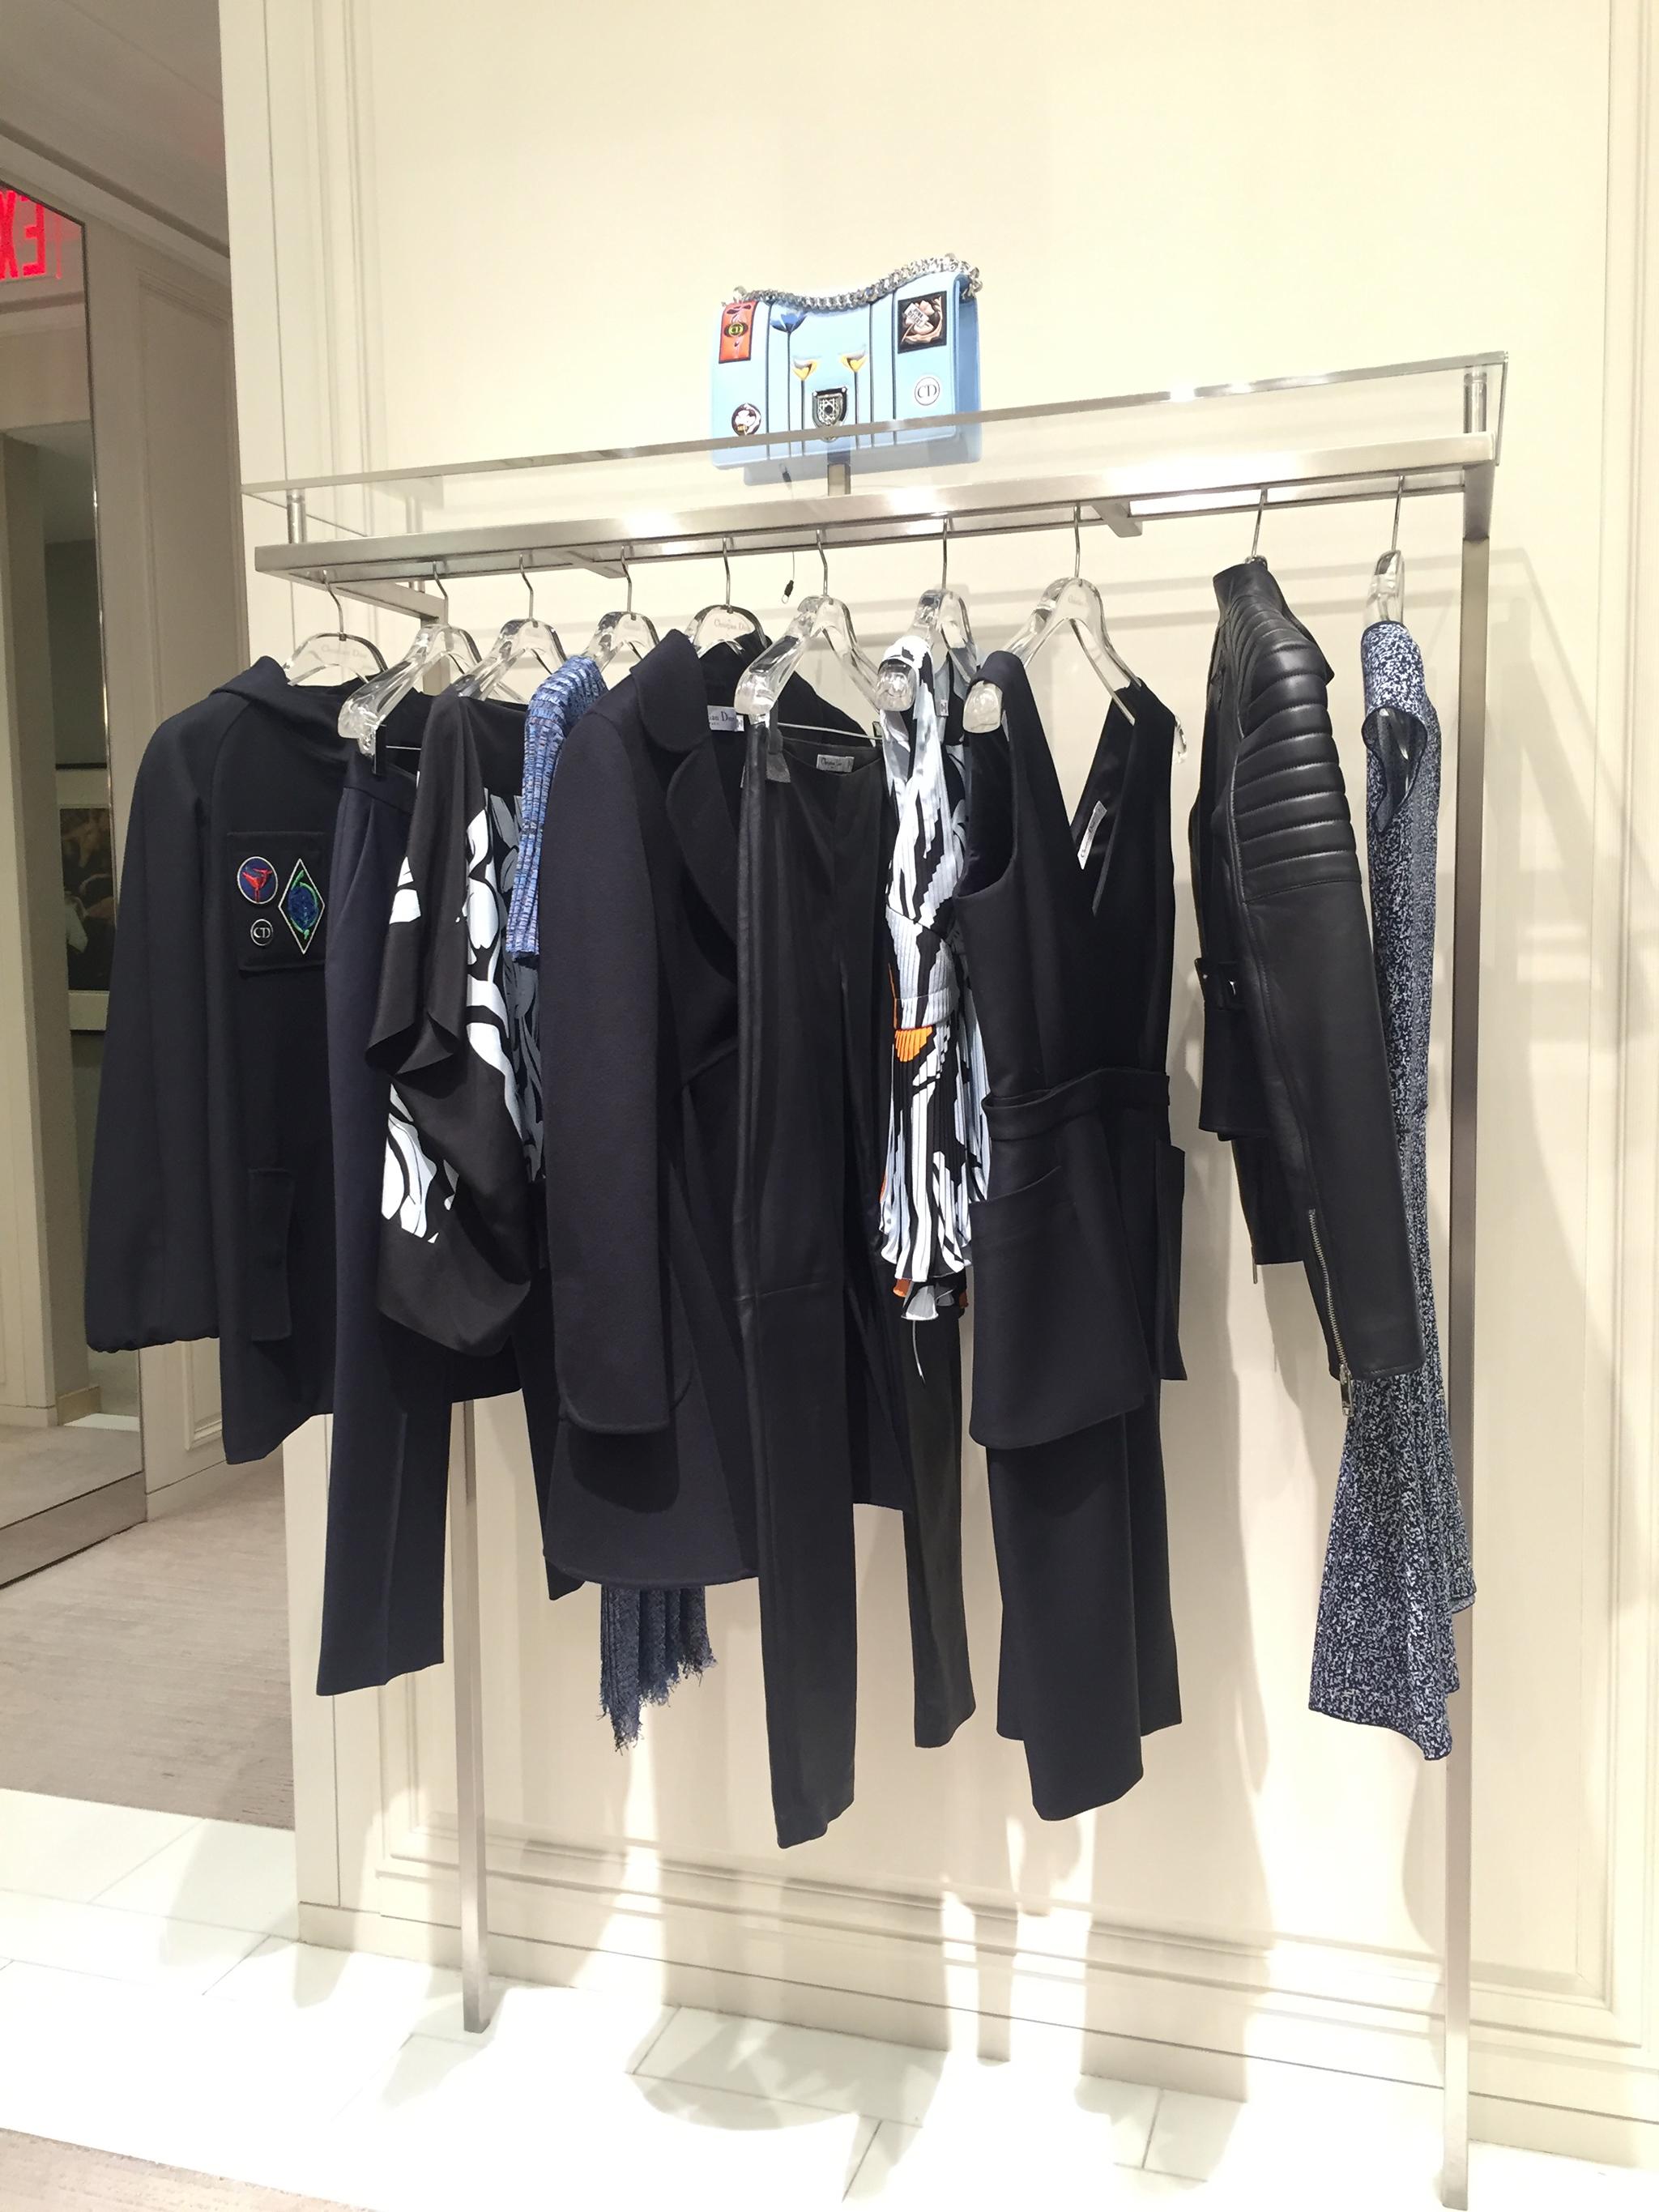 Dior-Saks-5th-Ave-03